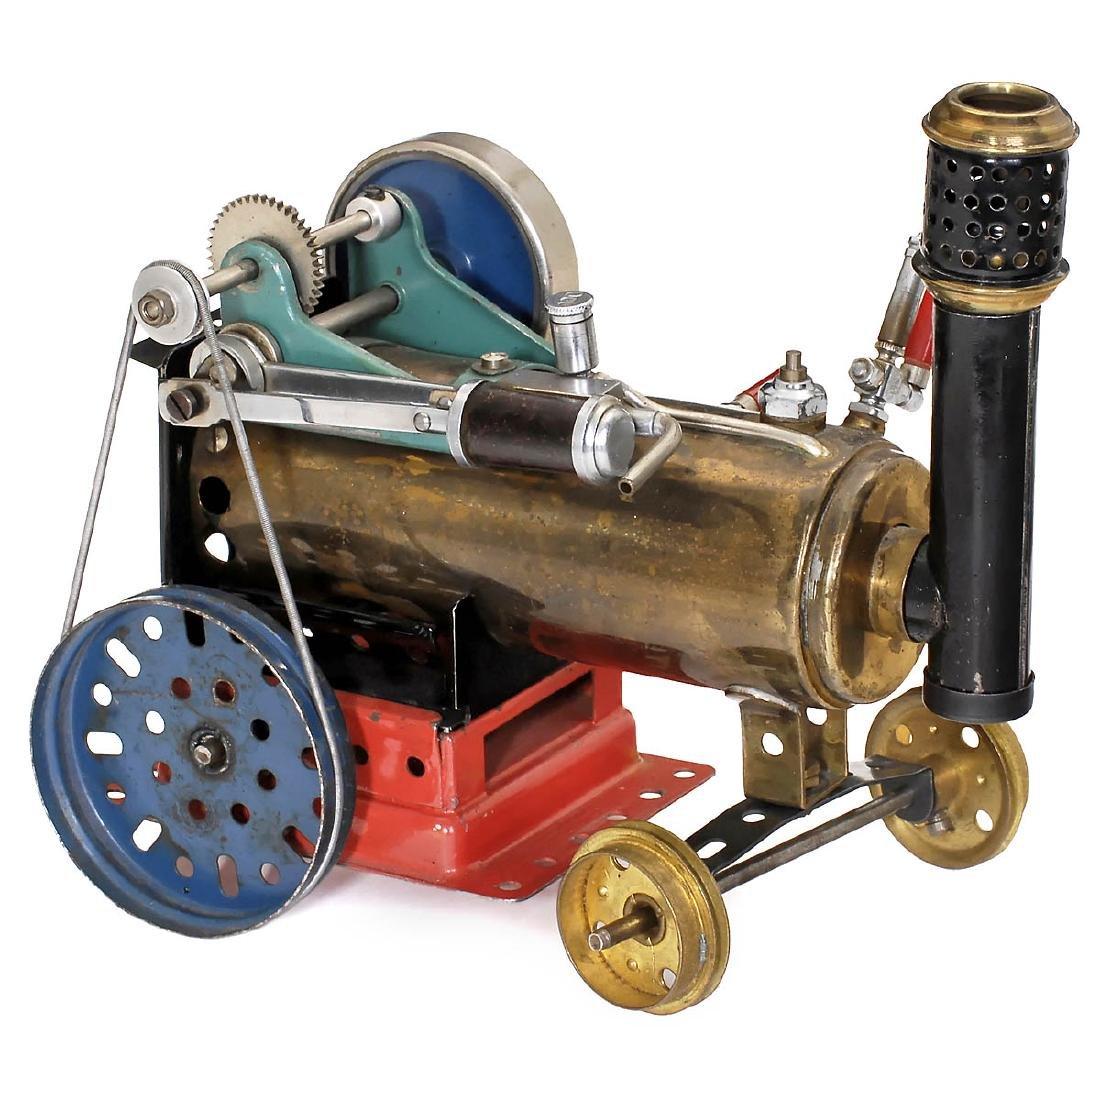 Märklin No. 401 Convertible Steam Engine, c. 1930